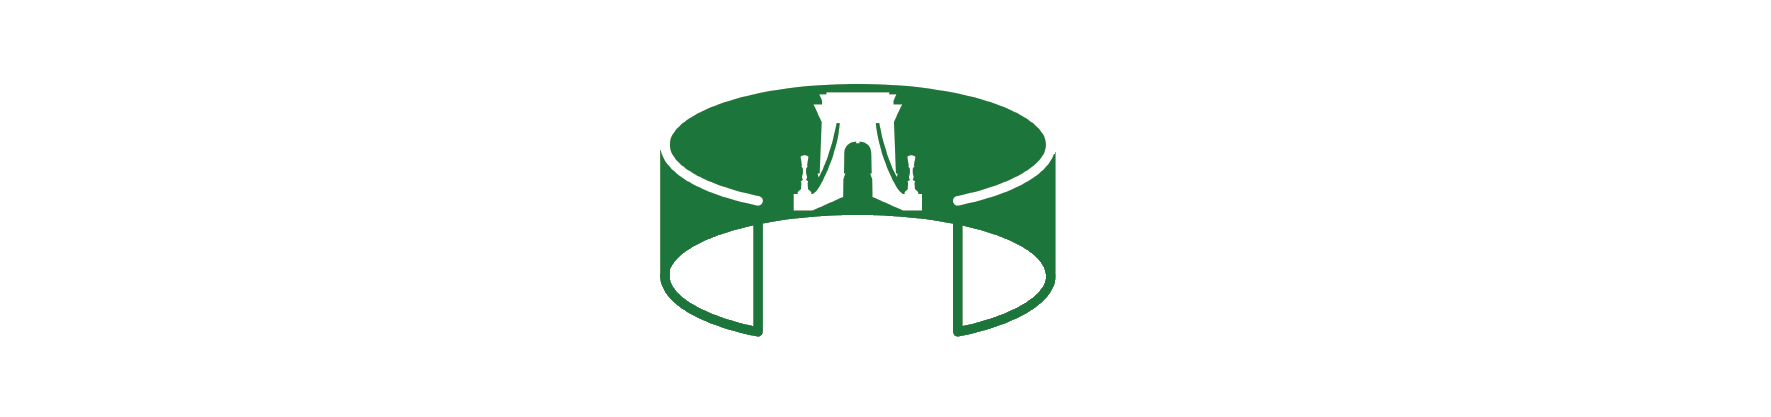 Budapest Közút logó